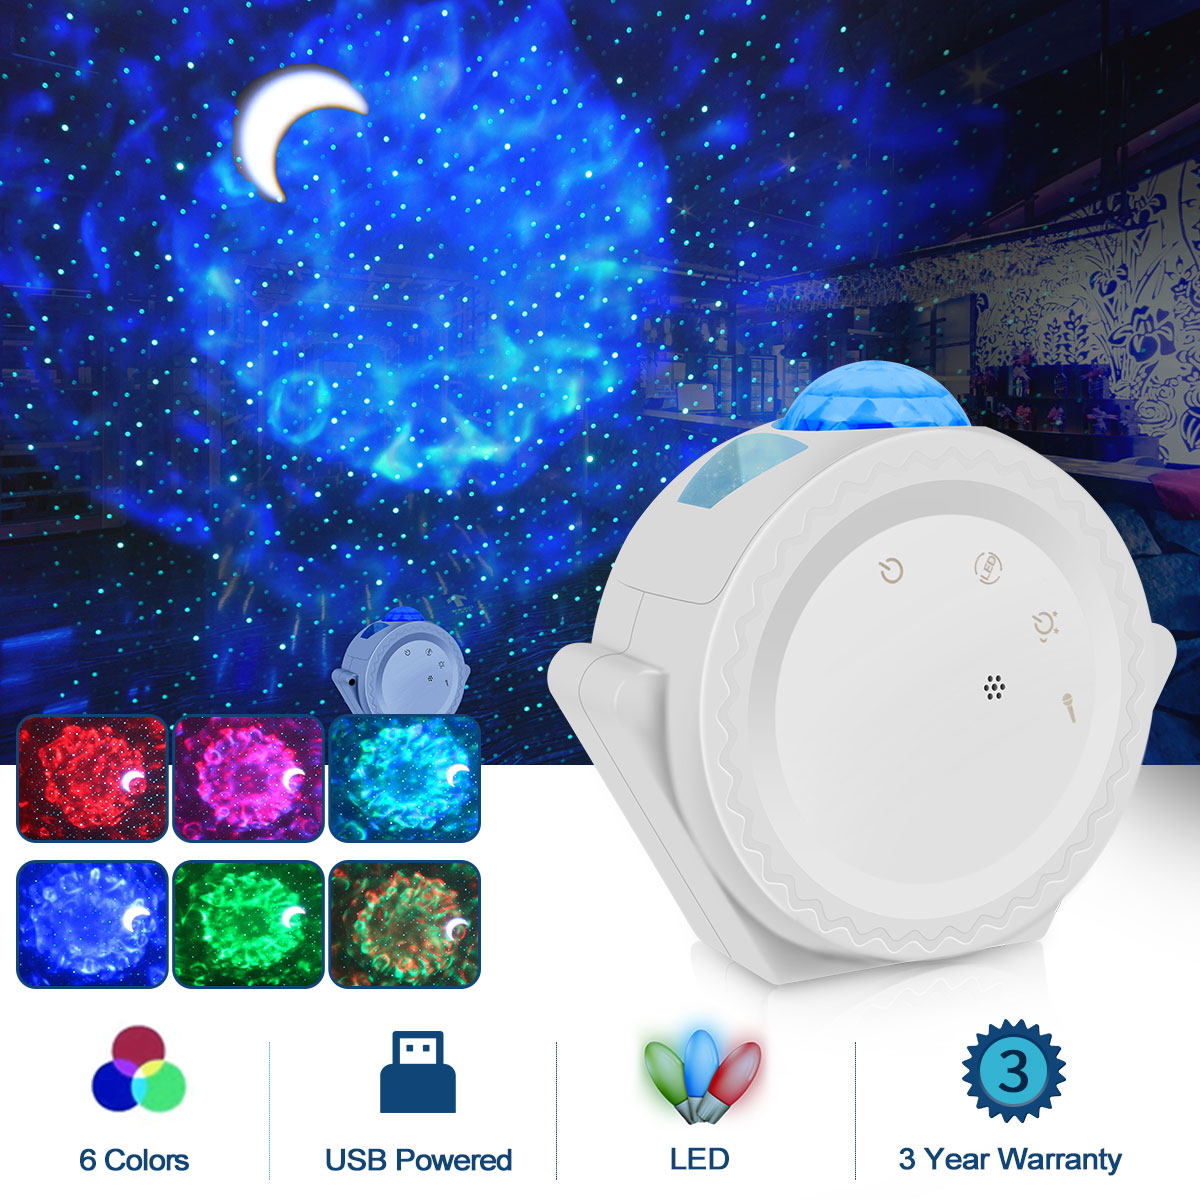 LED Star Projector Night Light Galaxy Starry 360 Degree Rotation Night Lighting Lamp Ocean Waving Night Lump For Kids Gift